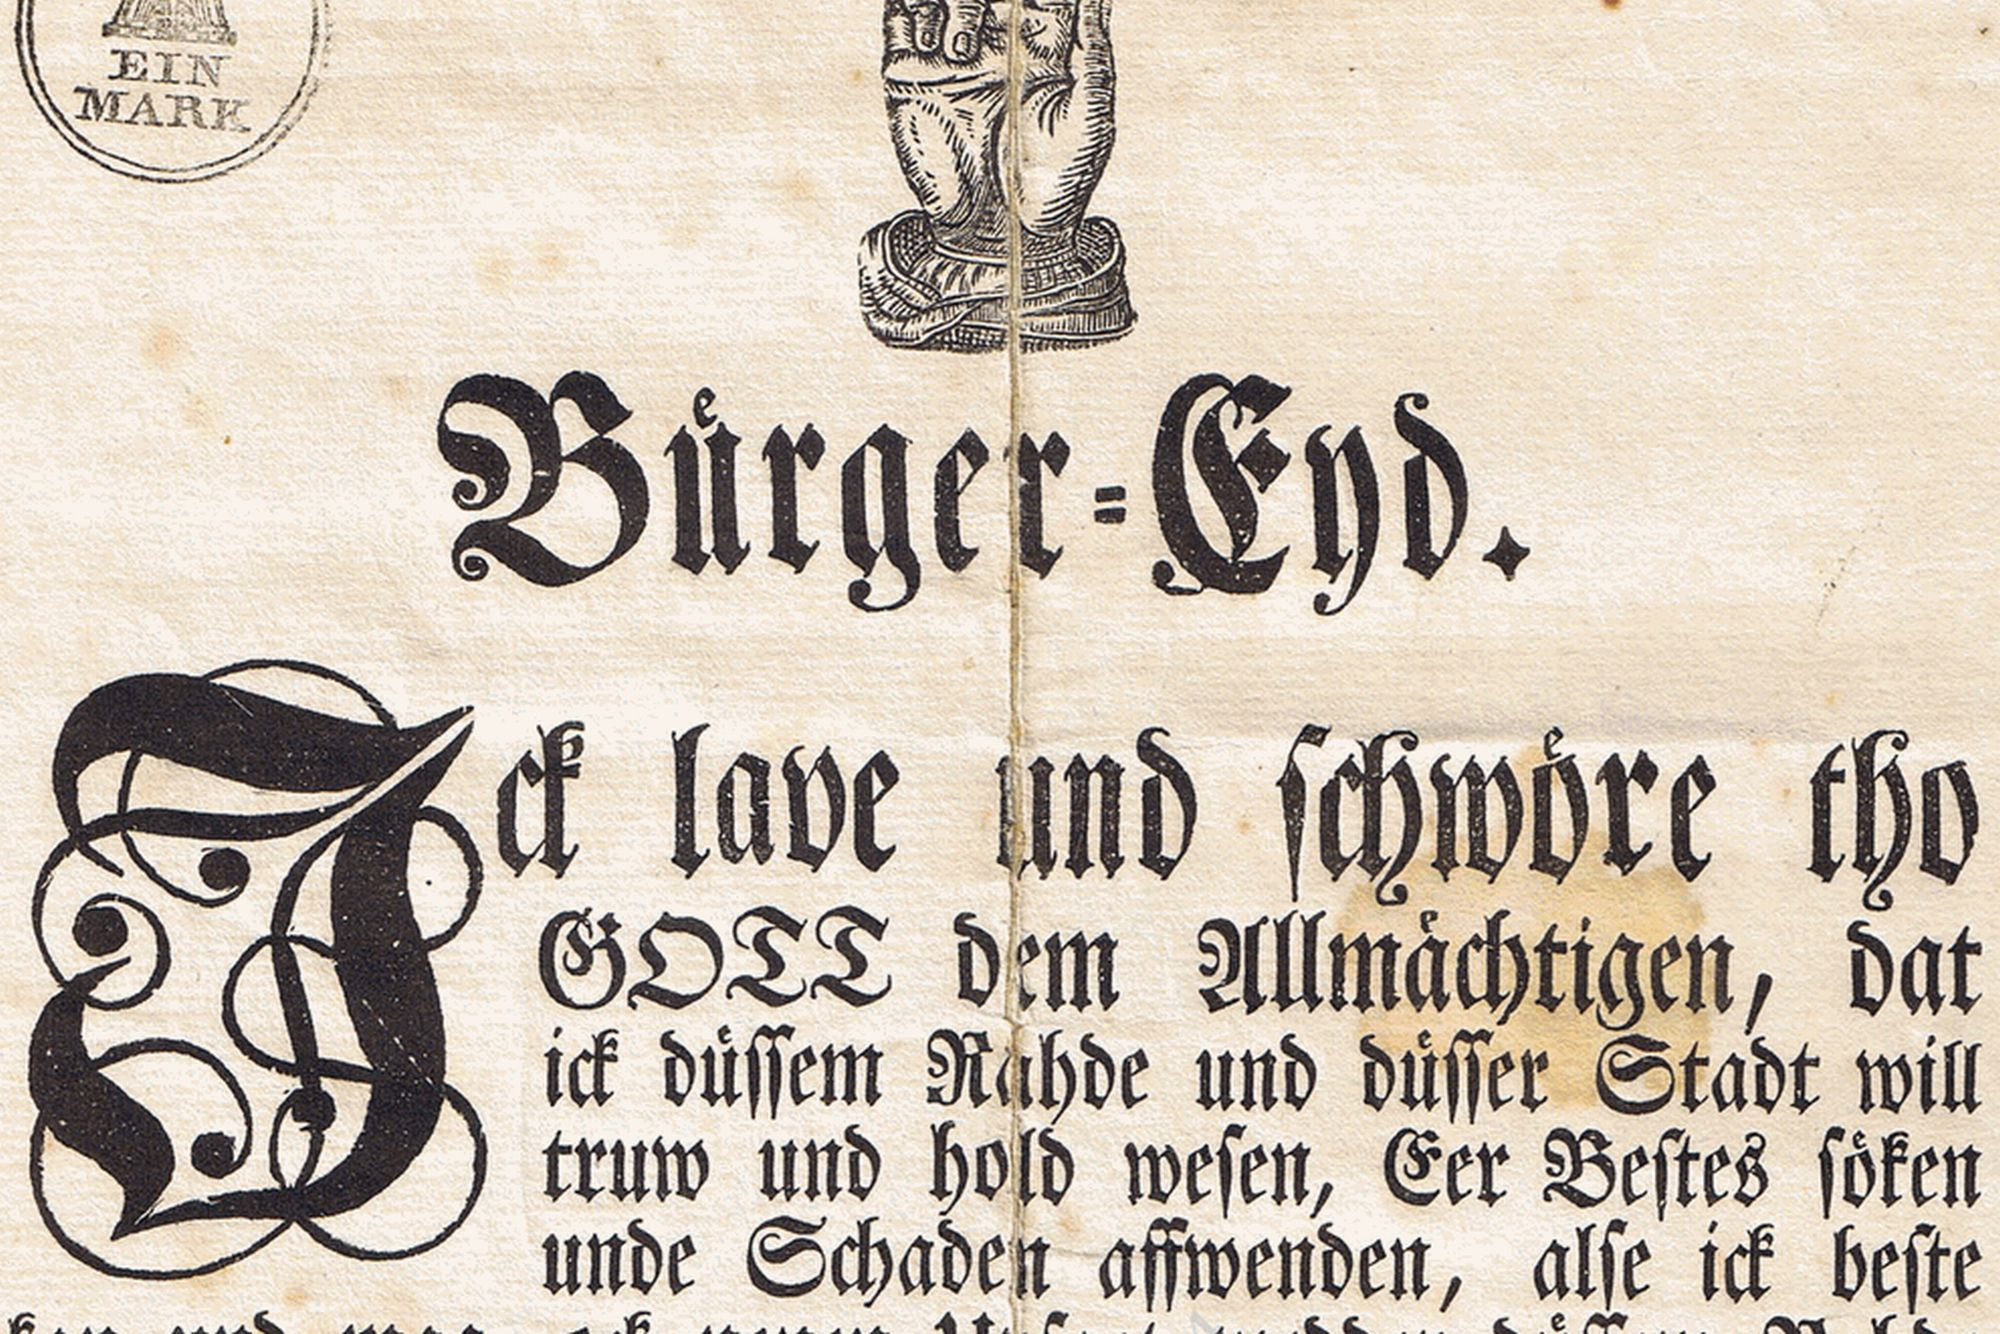 Hamburger Bürgereid - Prickett, Killea, Hamburger Bürgereid, Hamburger Bürger-Eyd, Hamburg, 1843